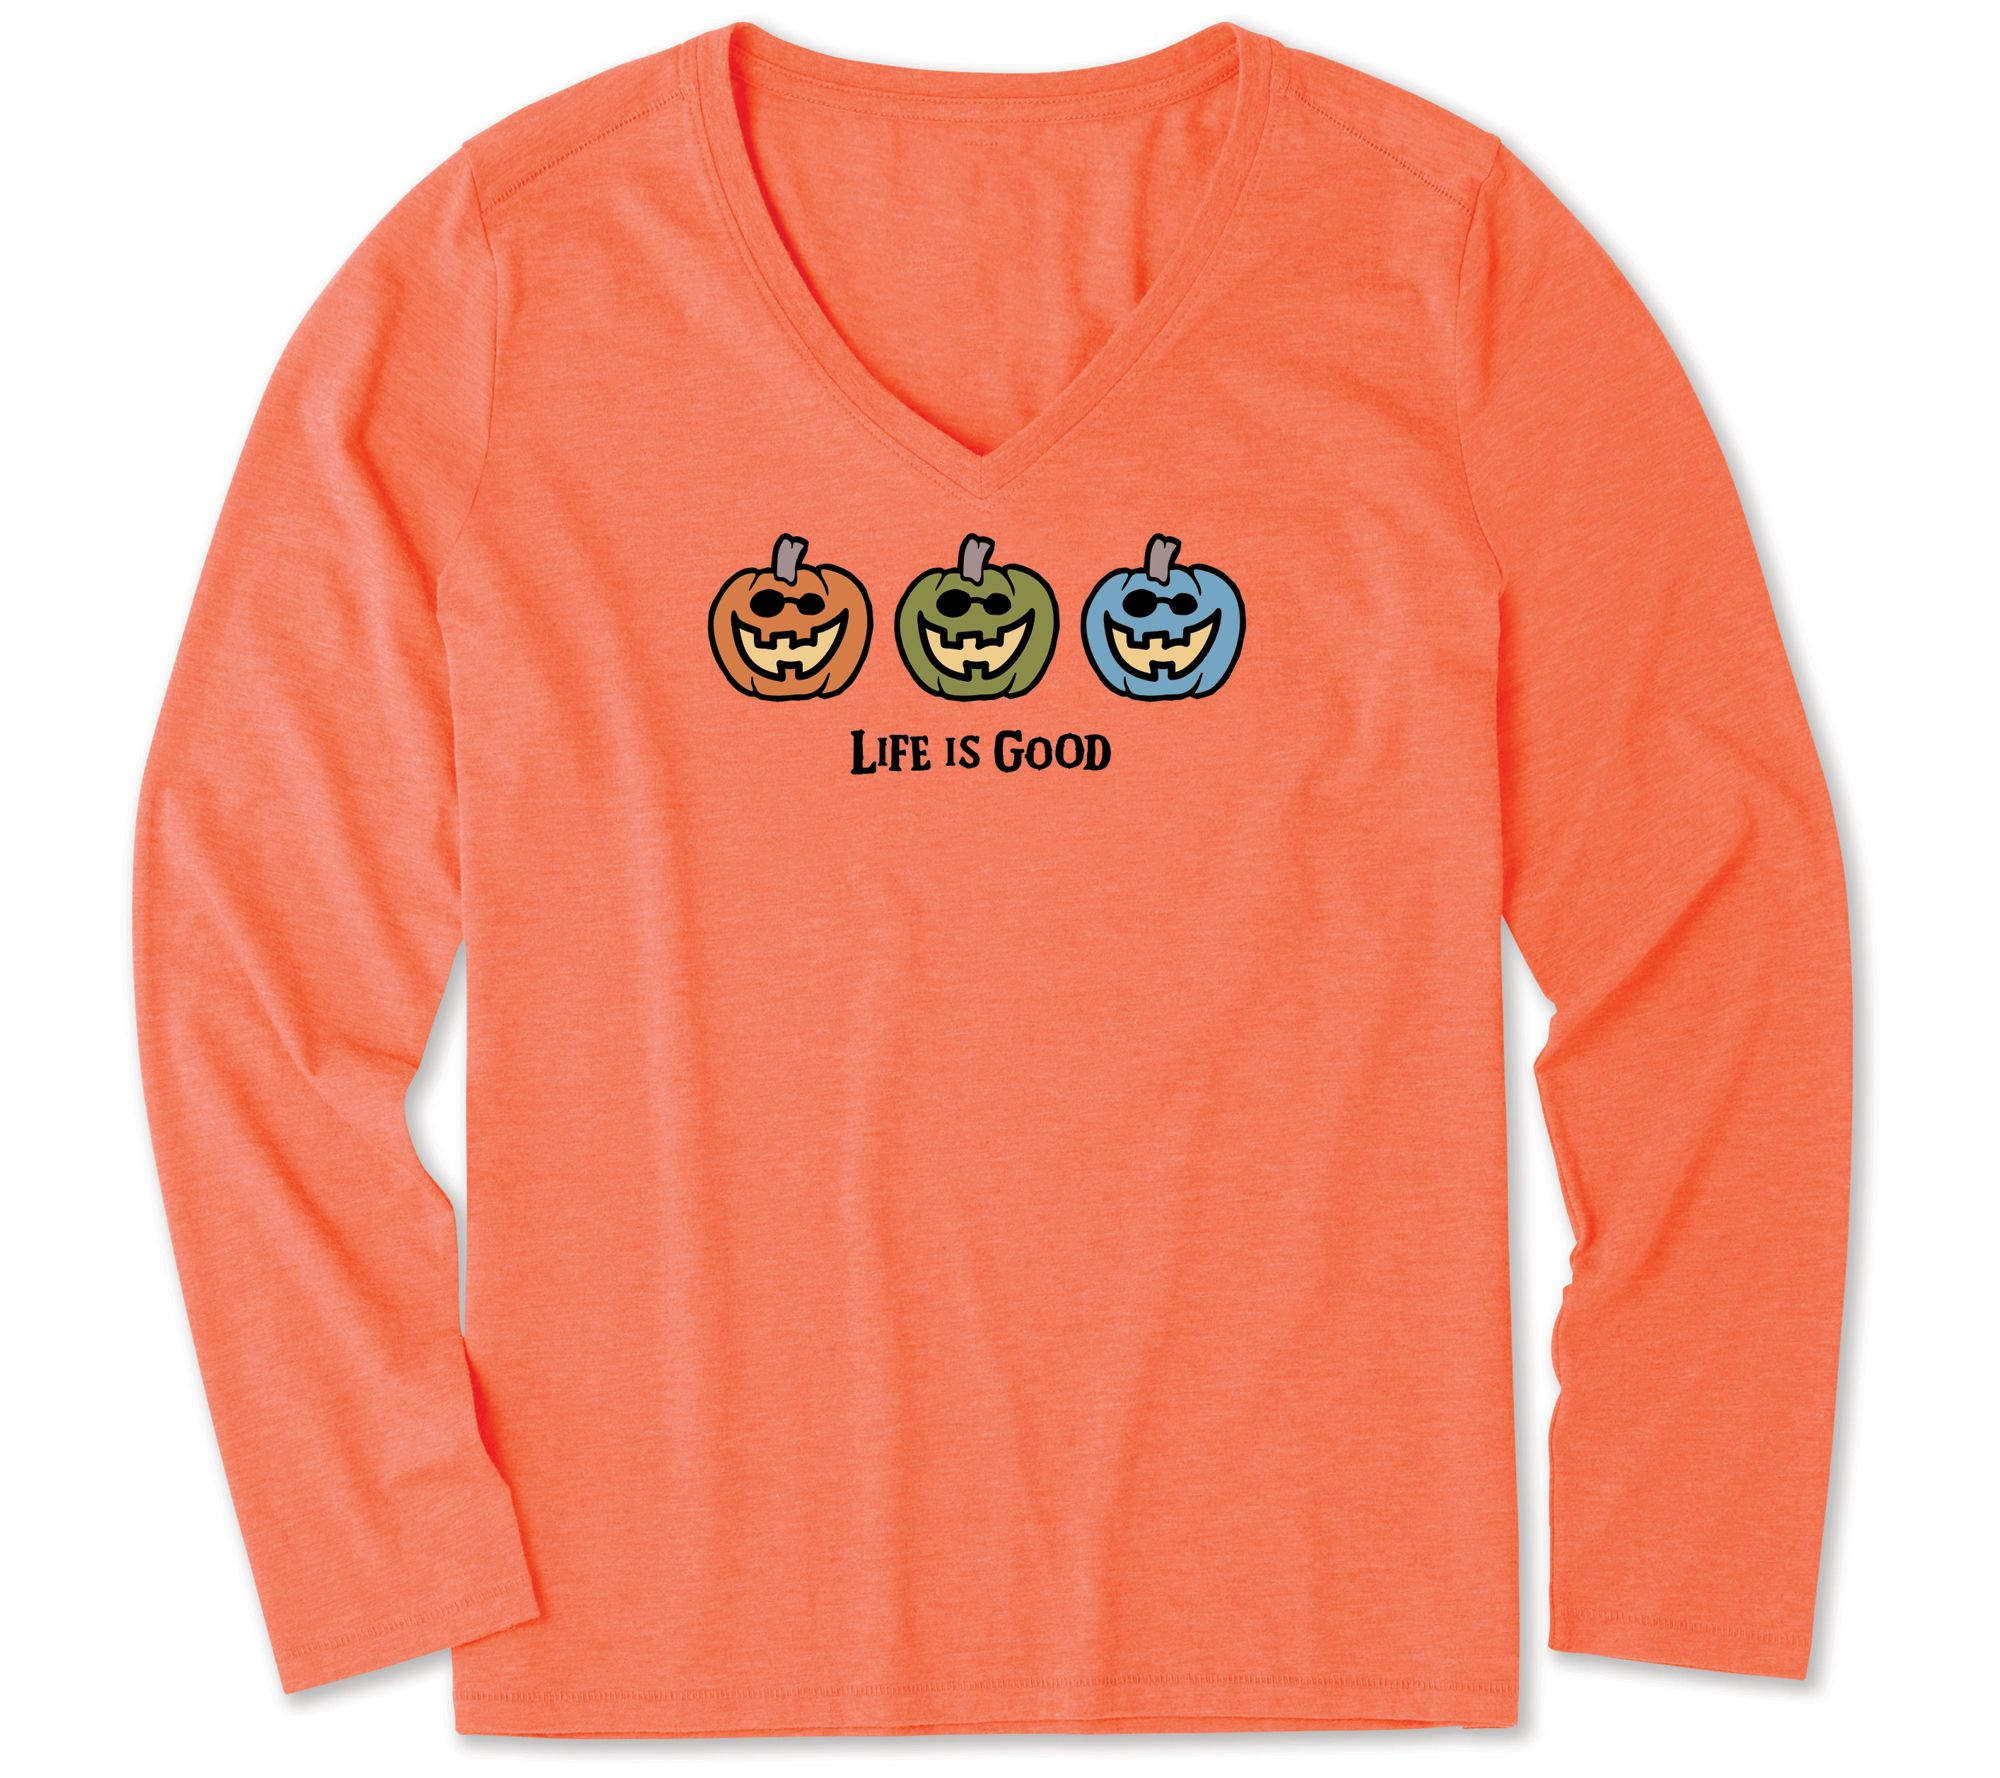 Life is Good Crusher Longsleeve Tee Pumpkin